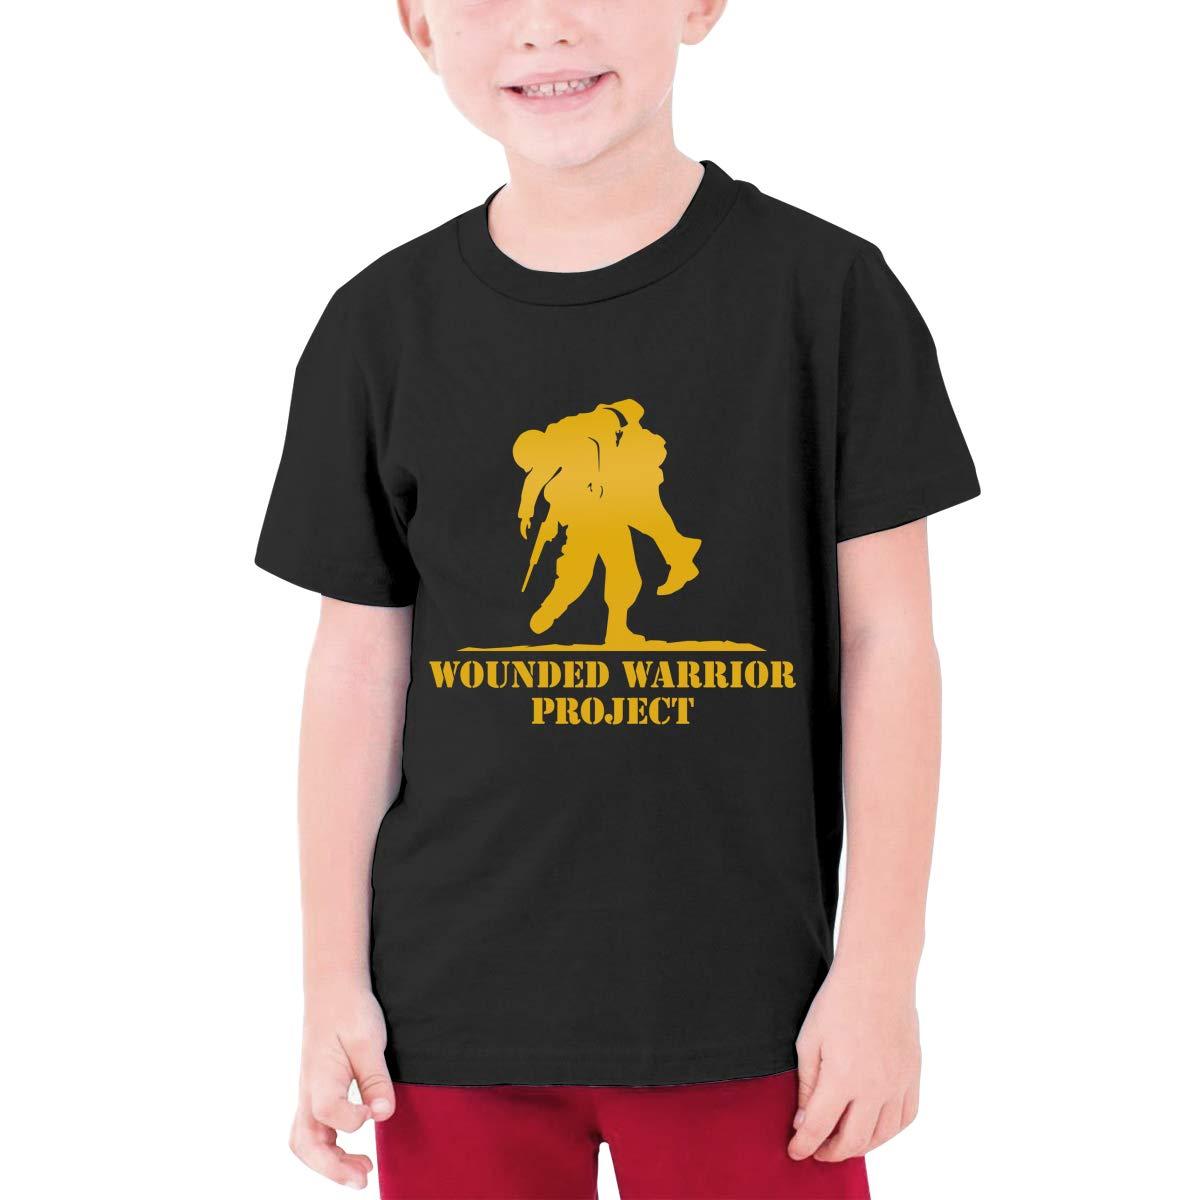 Kids Soft Cotton T Shirt Wounded Warrior Stylish Crewneck Short Sleeve Tops Black